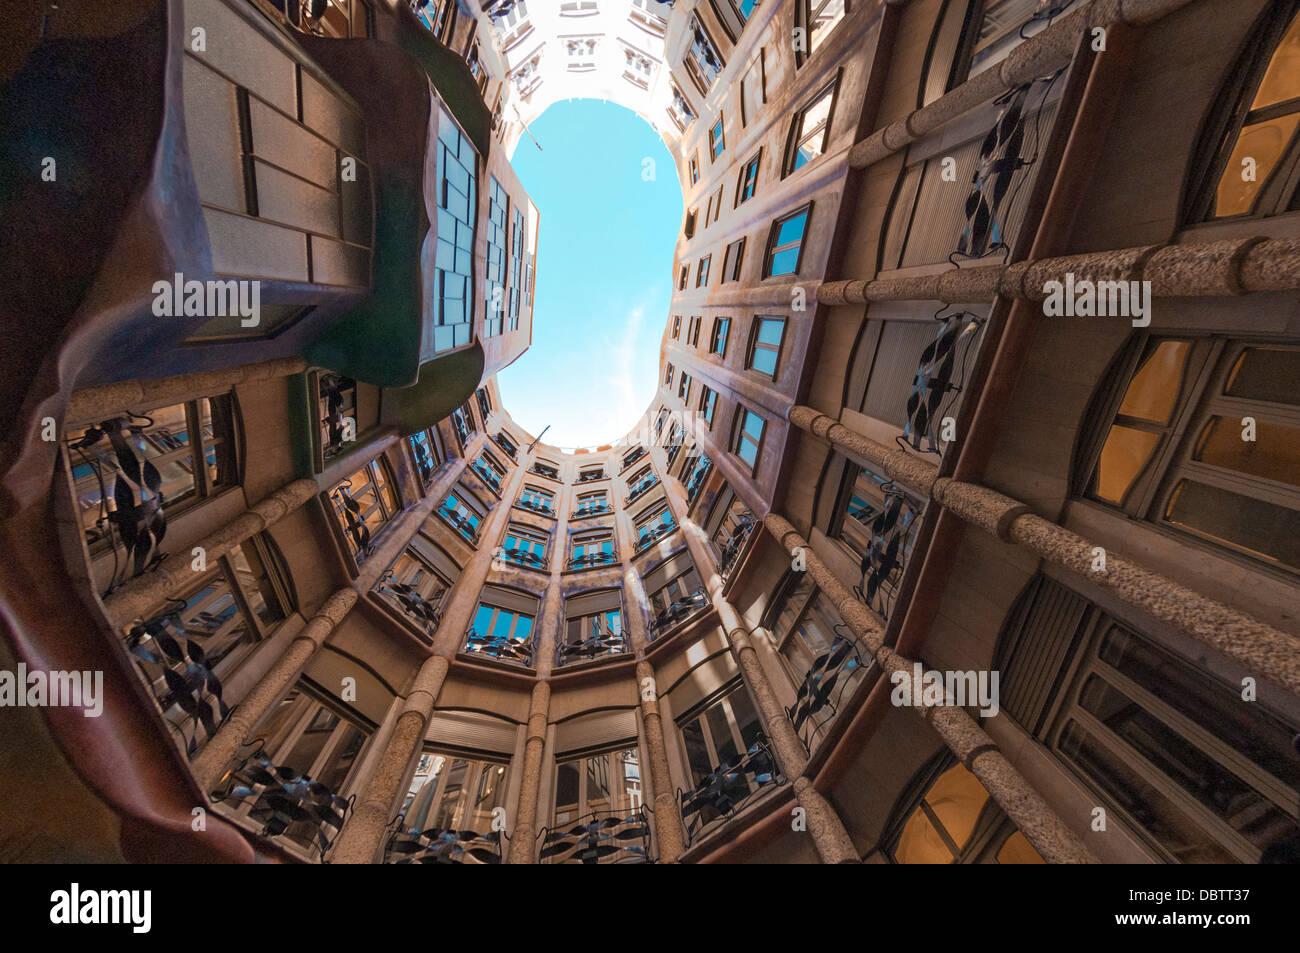 Inneren Fisch Blick auf La Pedrera (Casa Mila), Passeig de Gracia, Barcelona, Katalonien, Spanien Stockbild